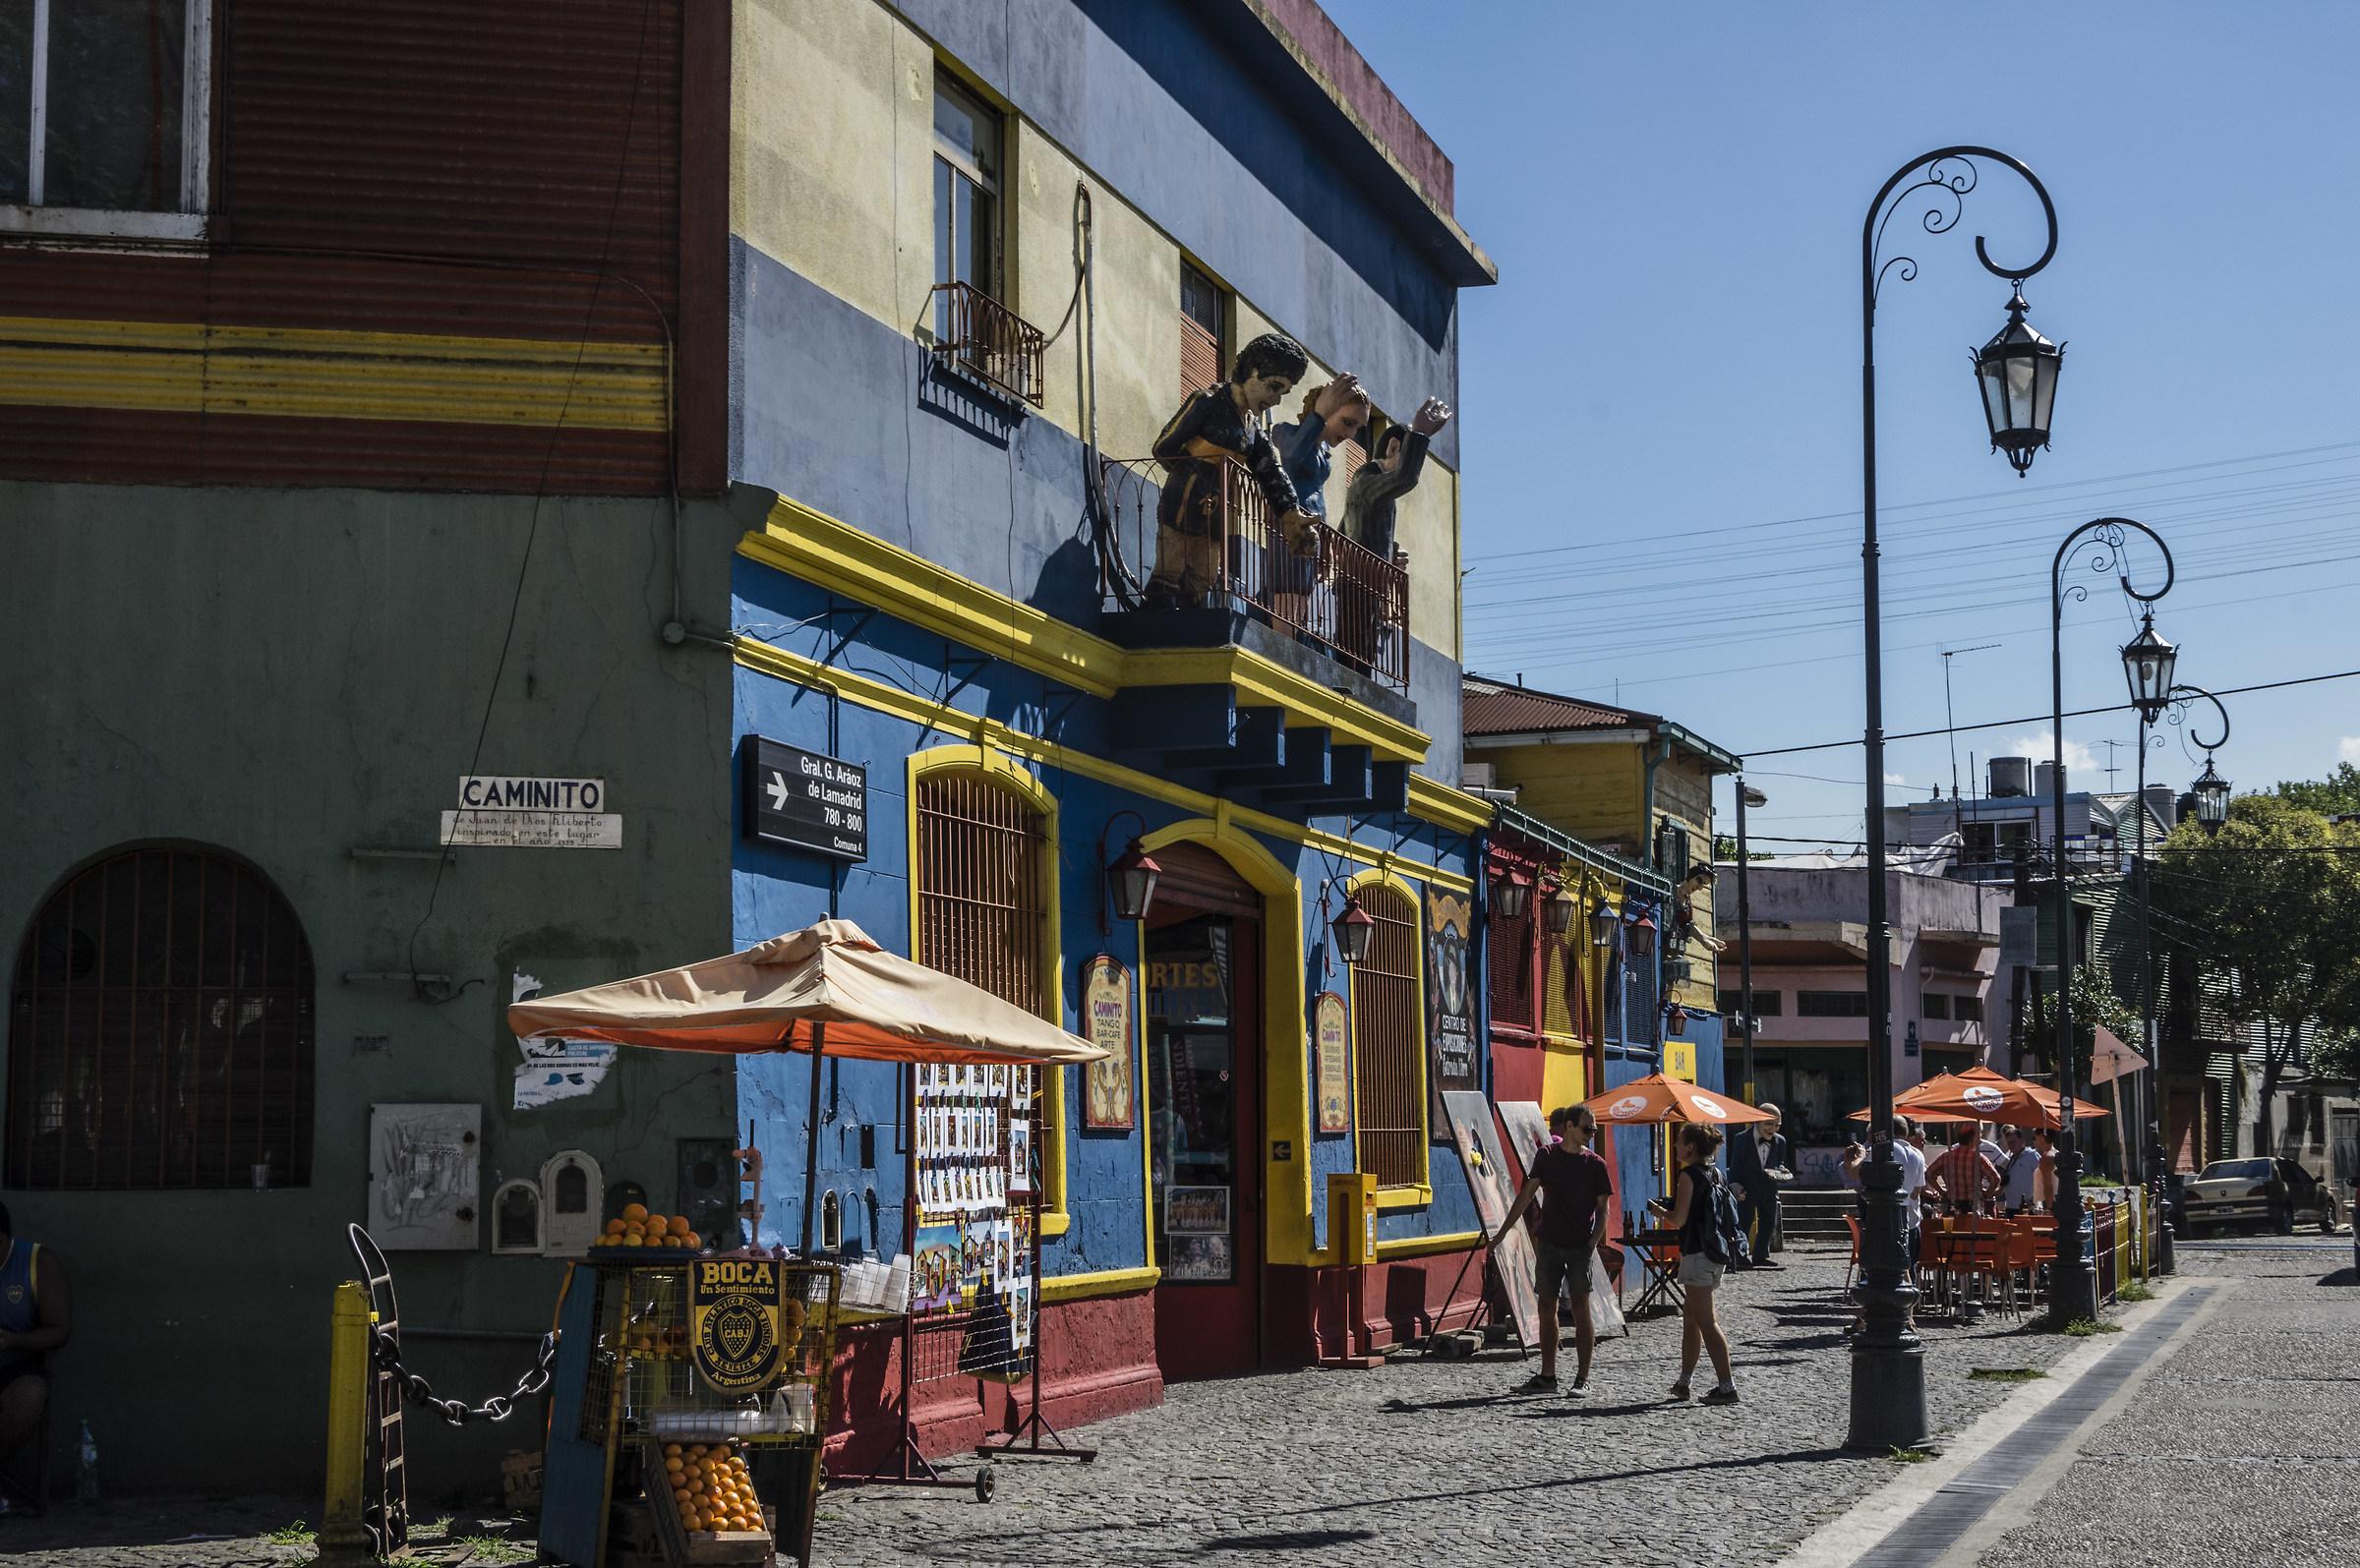 Caminito Buenos Aires...